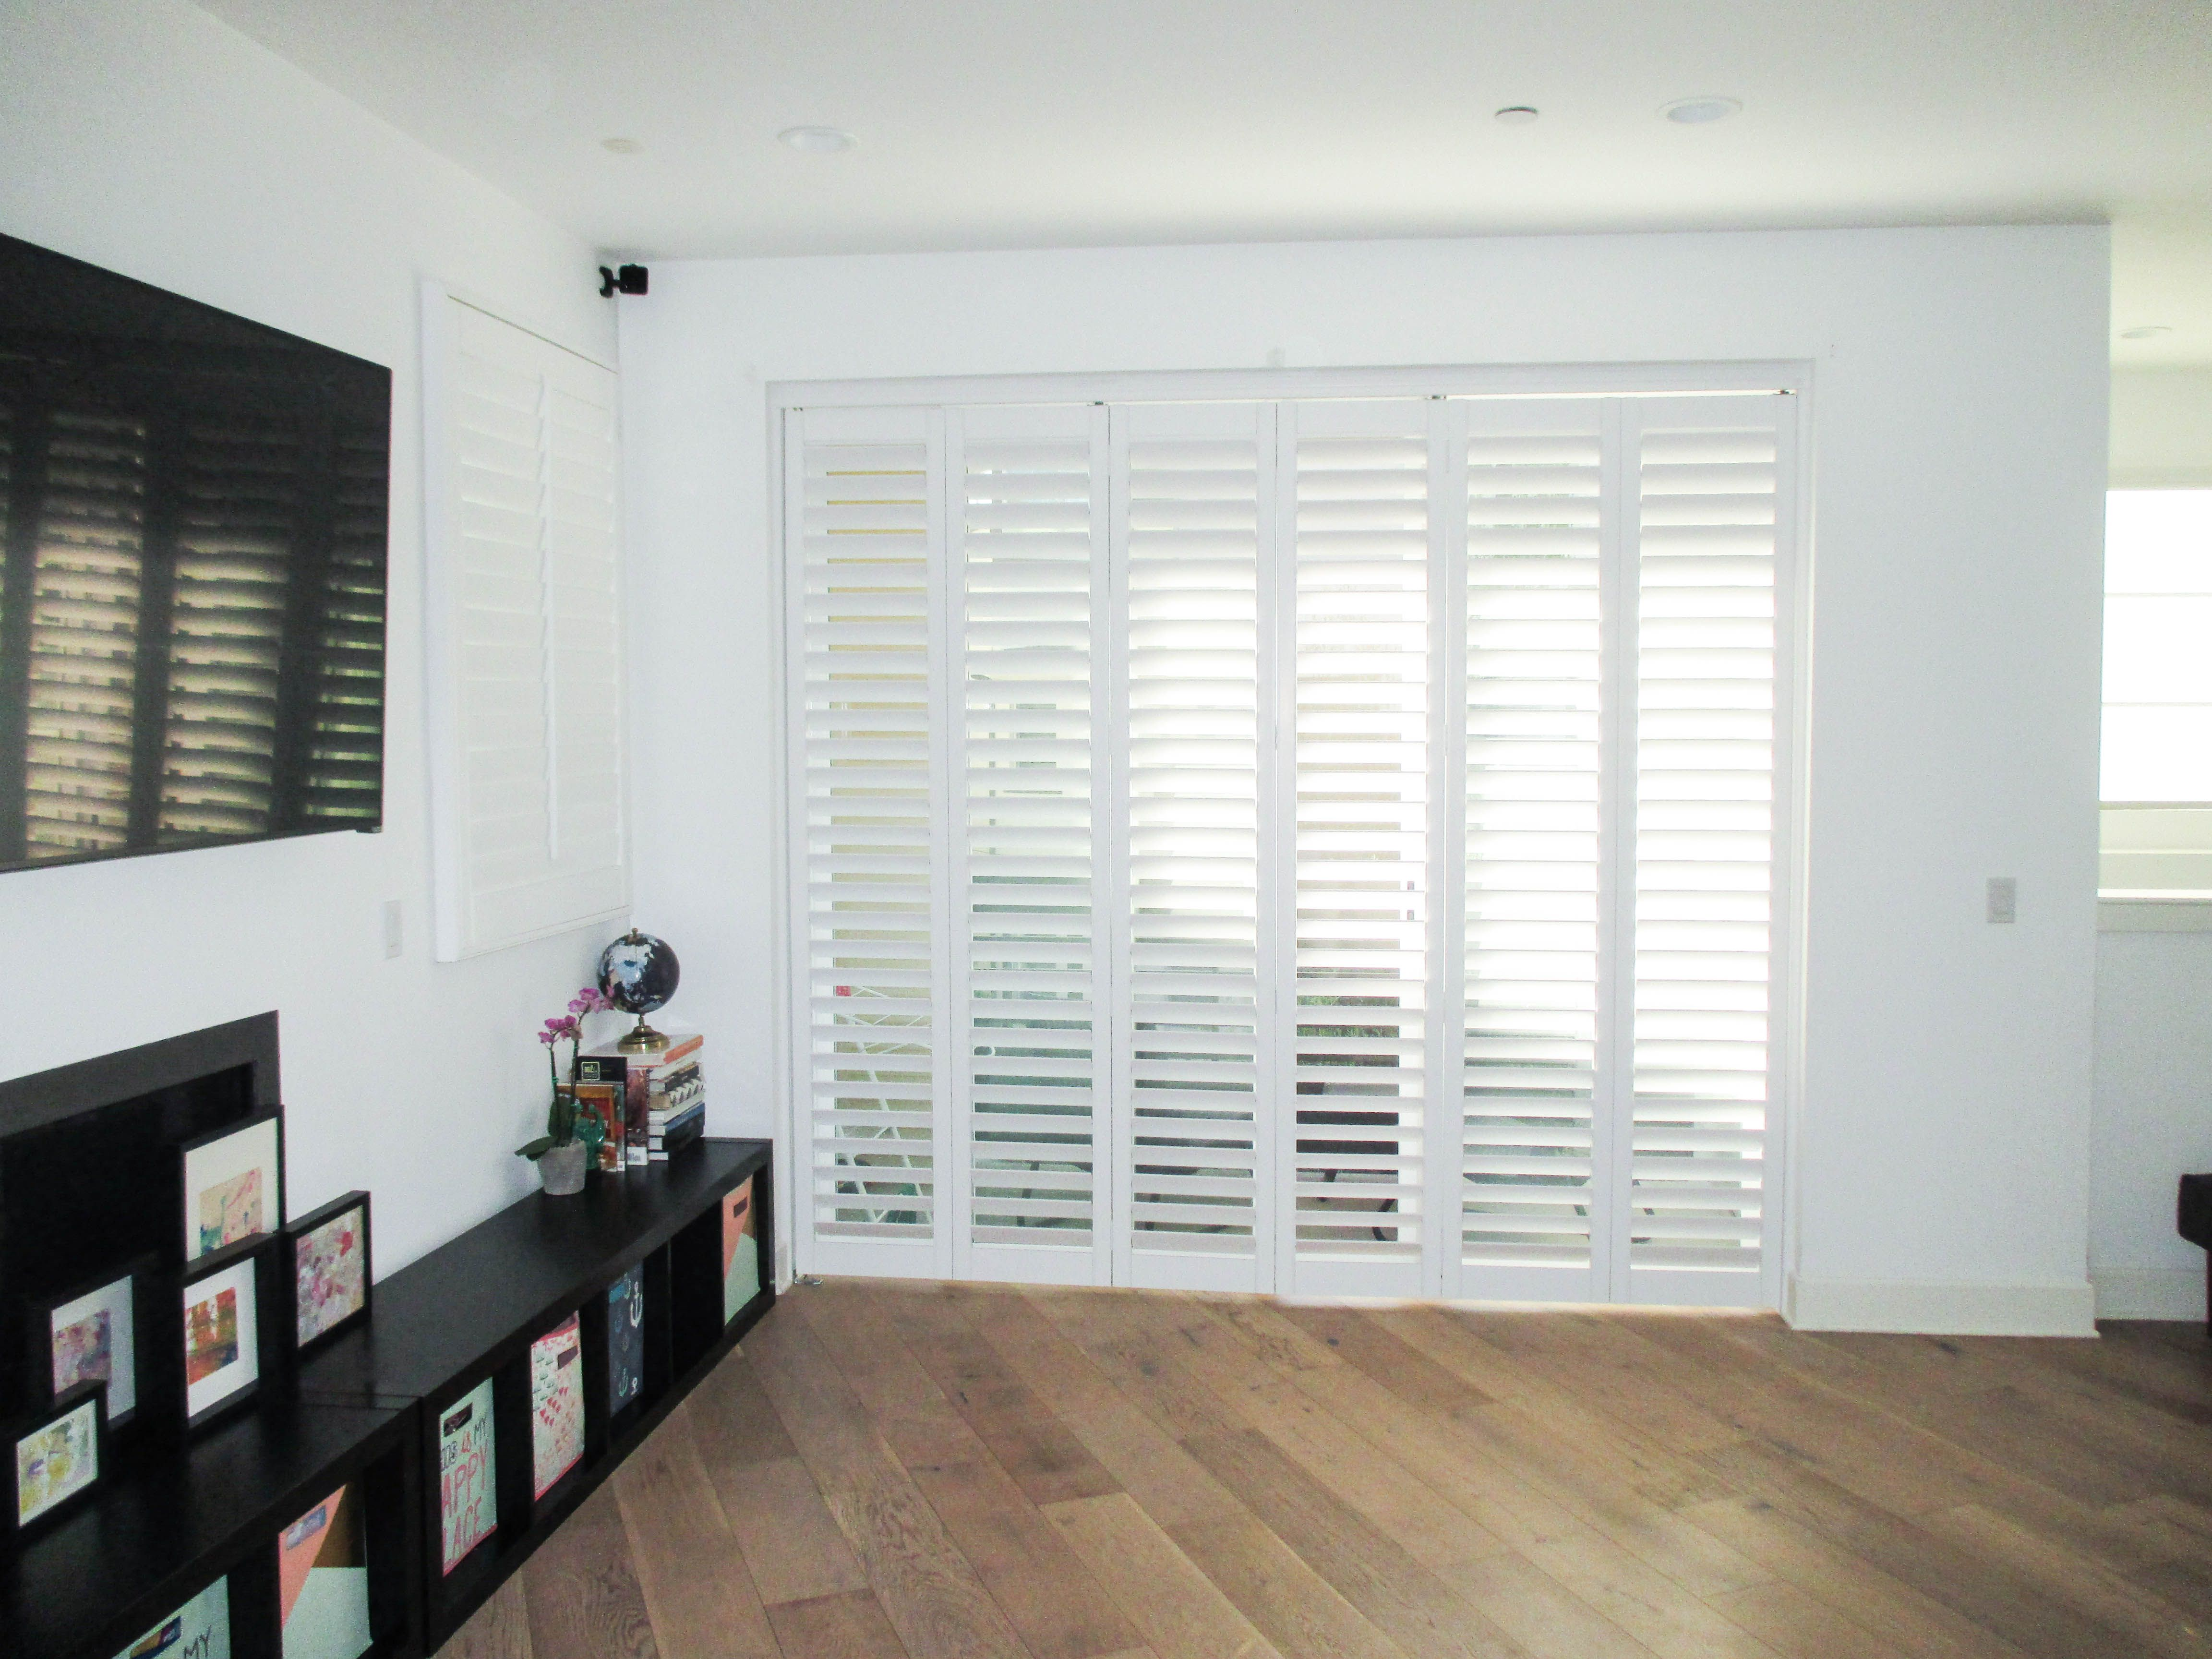 shutters bay windo test img gallery van inch interior plantation go composite in window image